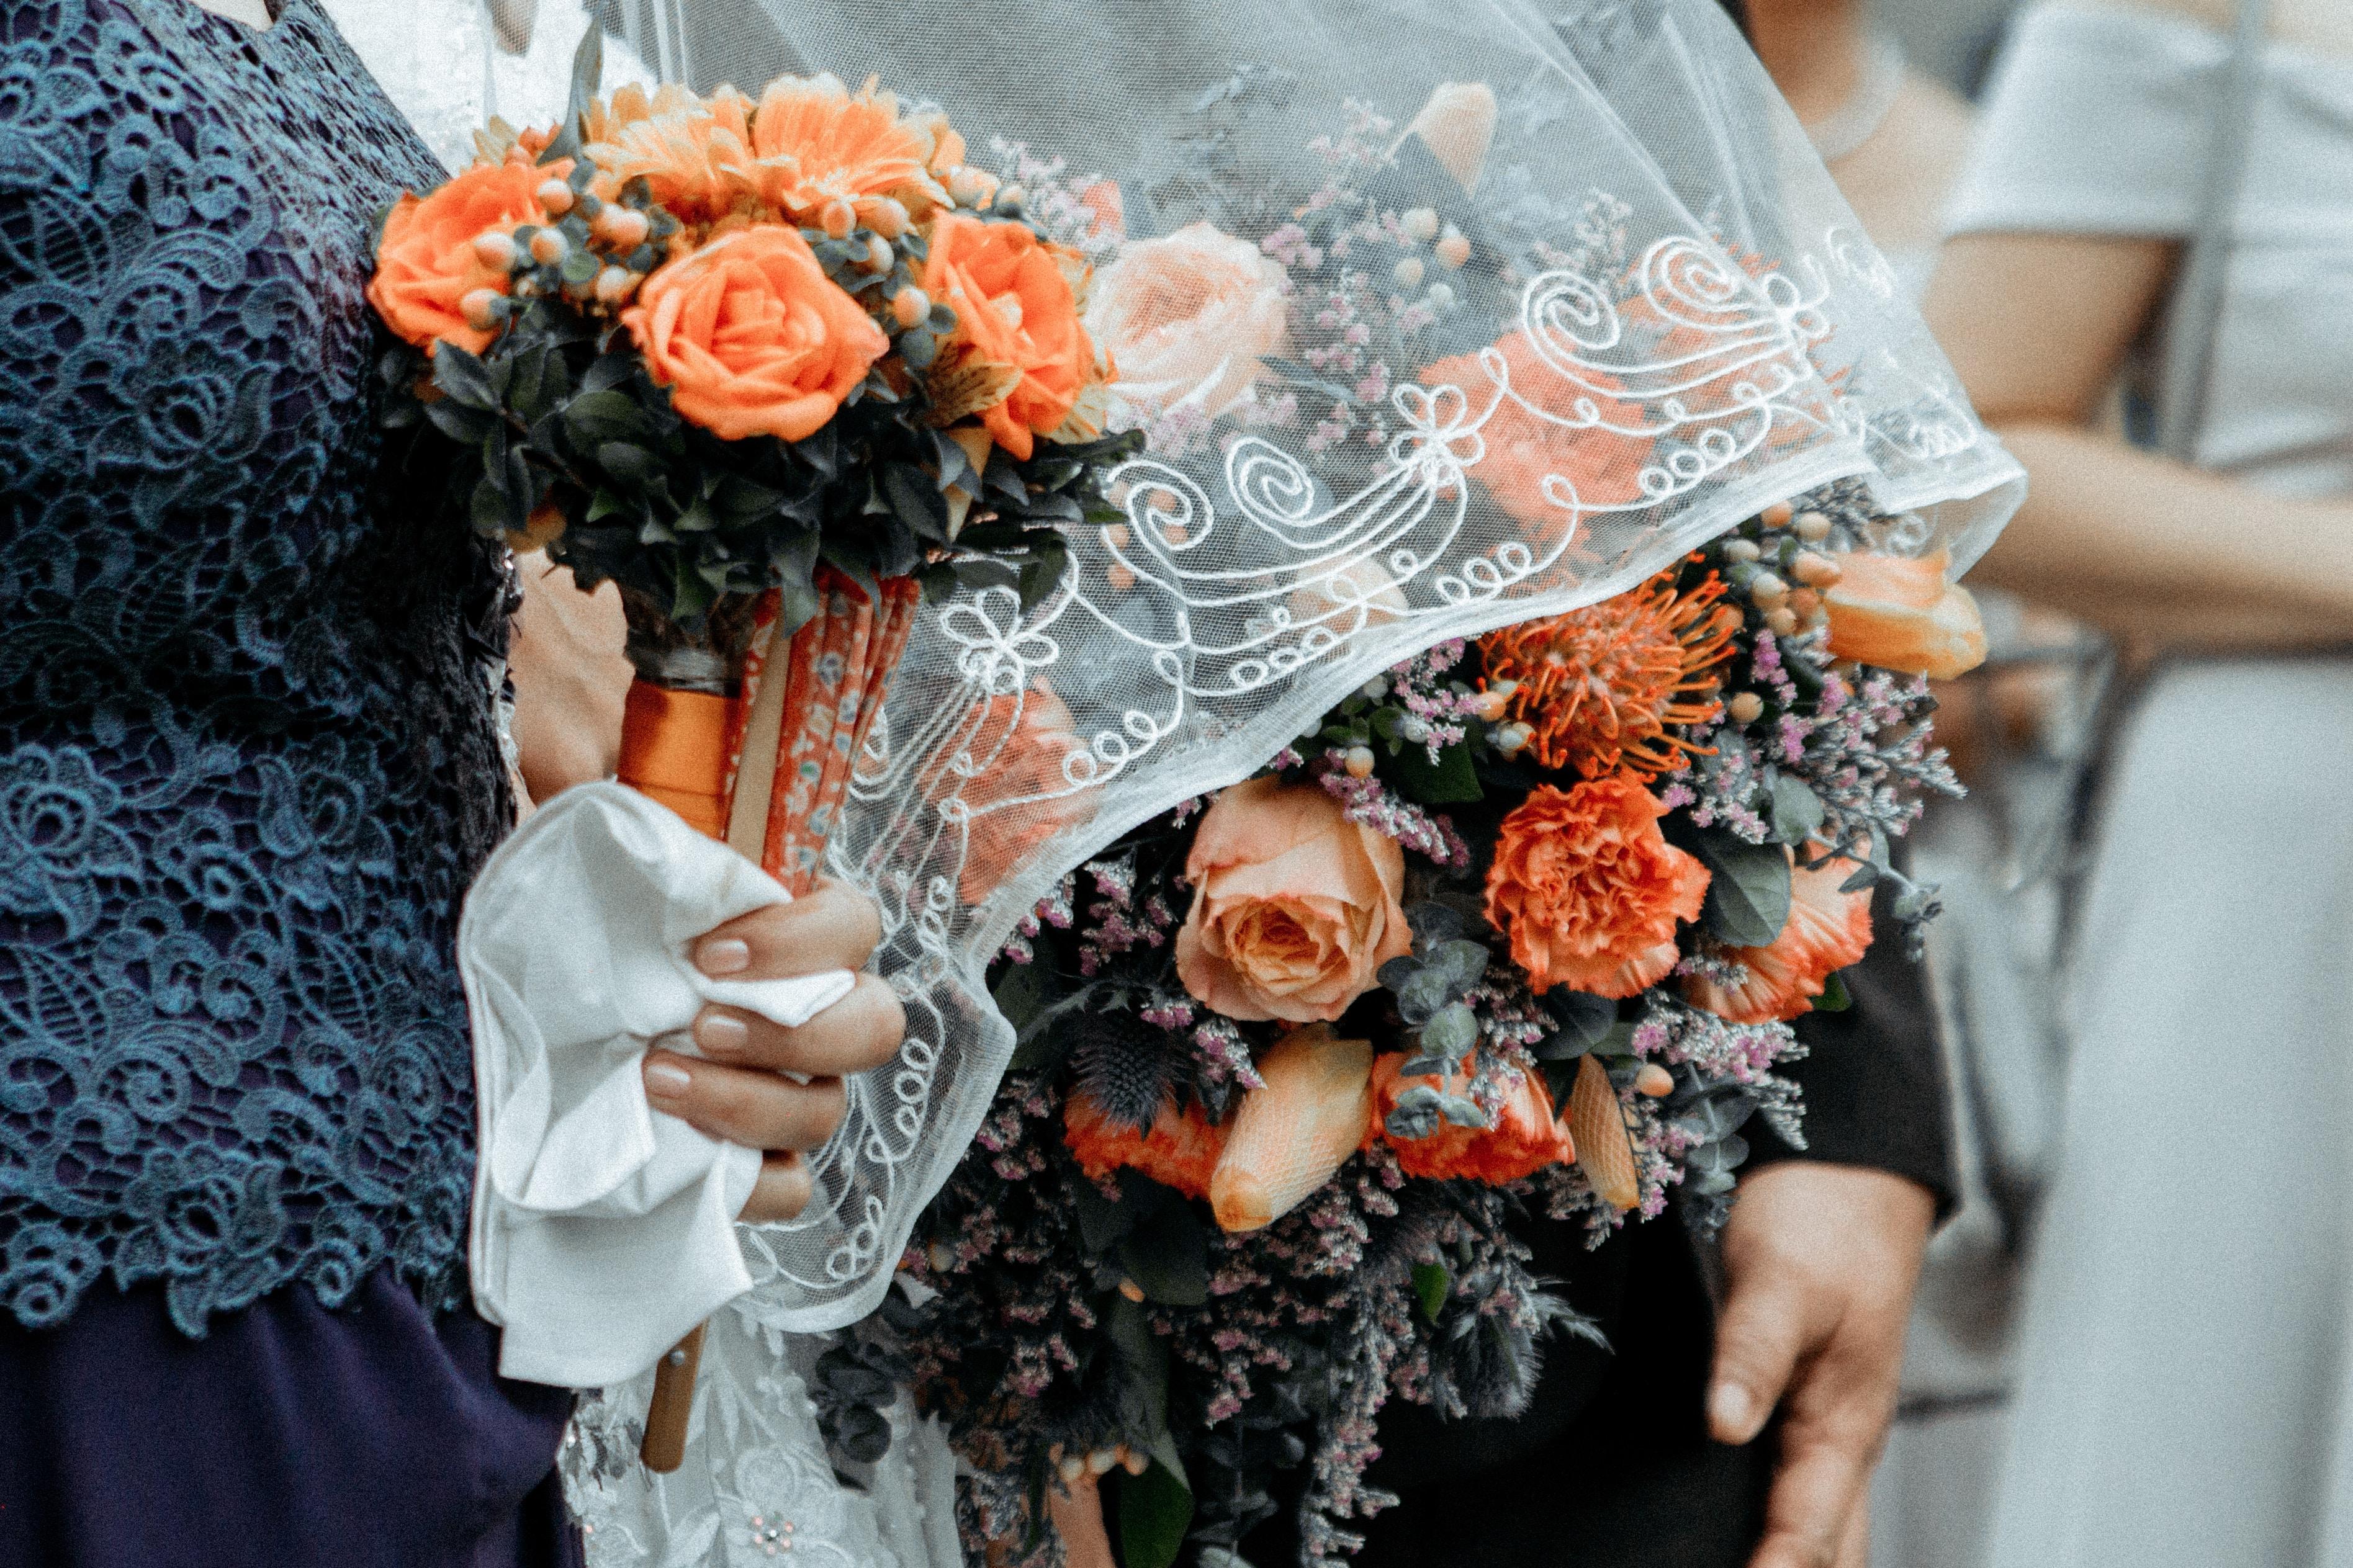 person holding flower bouquet